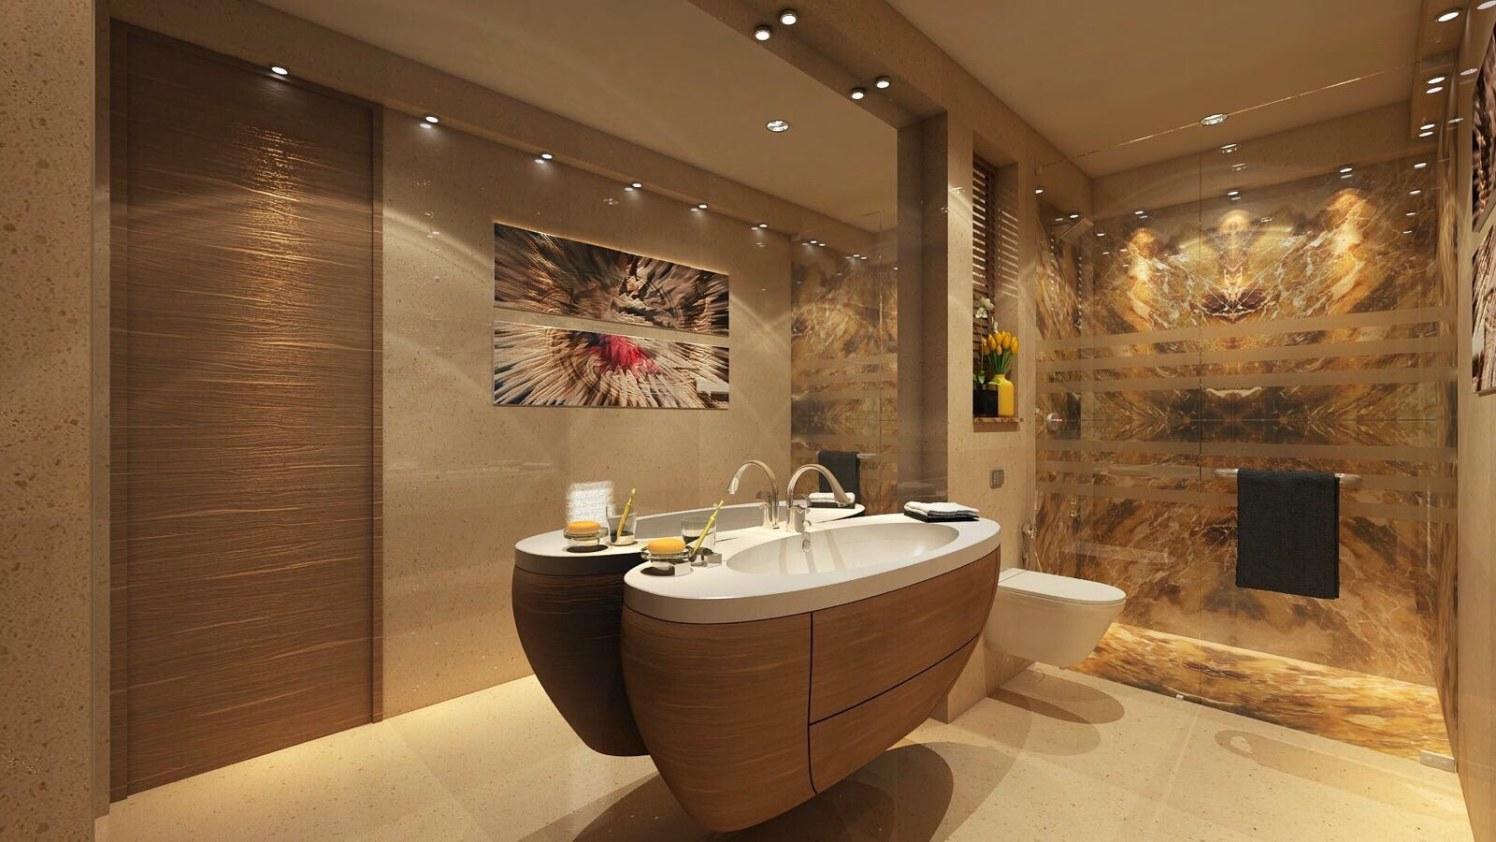 Artistic Bathroom With Walk In Shower by Anshuma Vaidya Bora Bathroom Modern | Interior Design Photos & Ideas